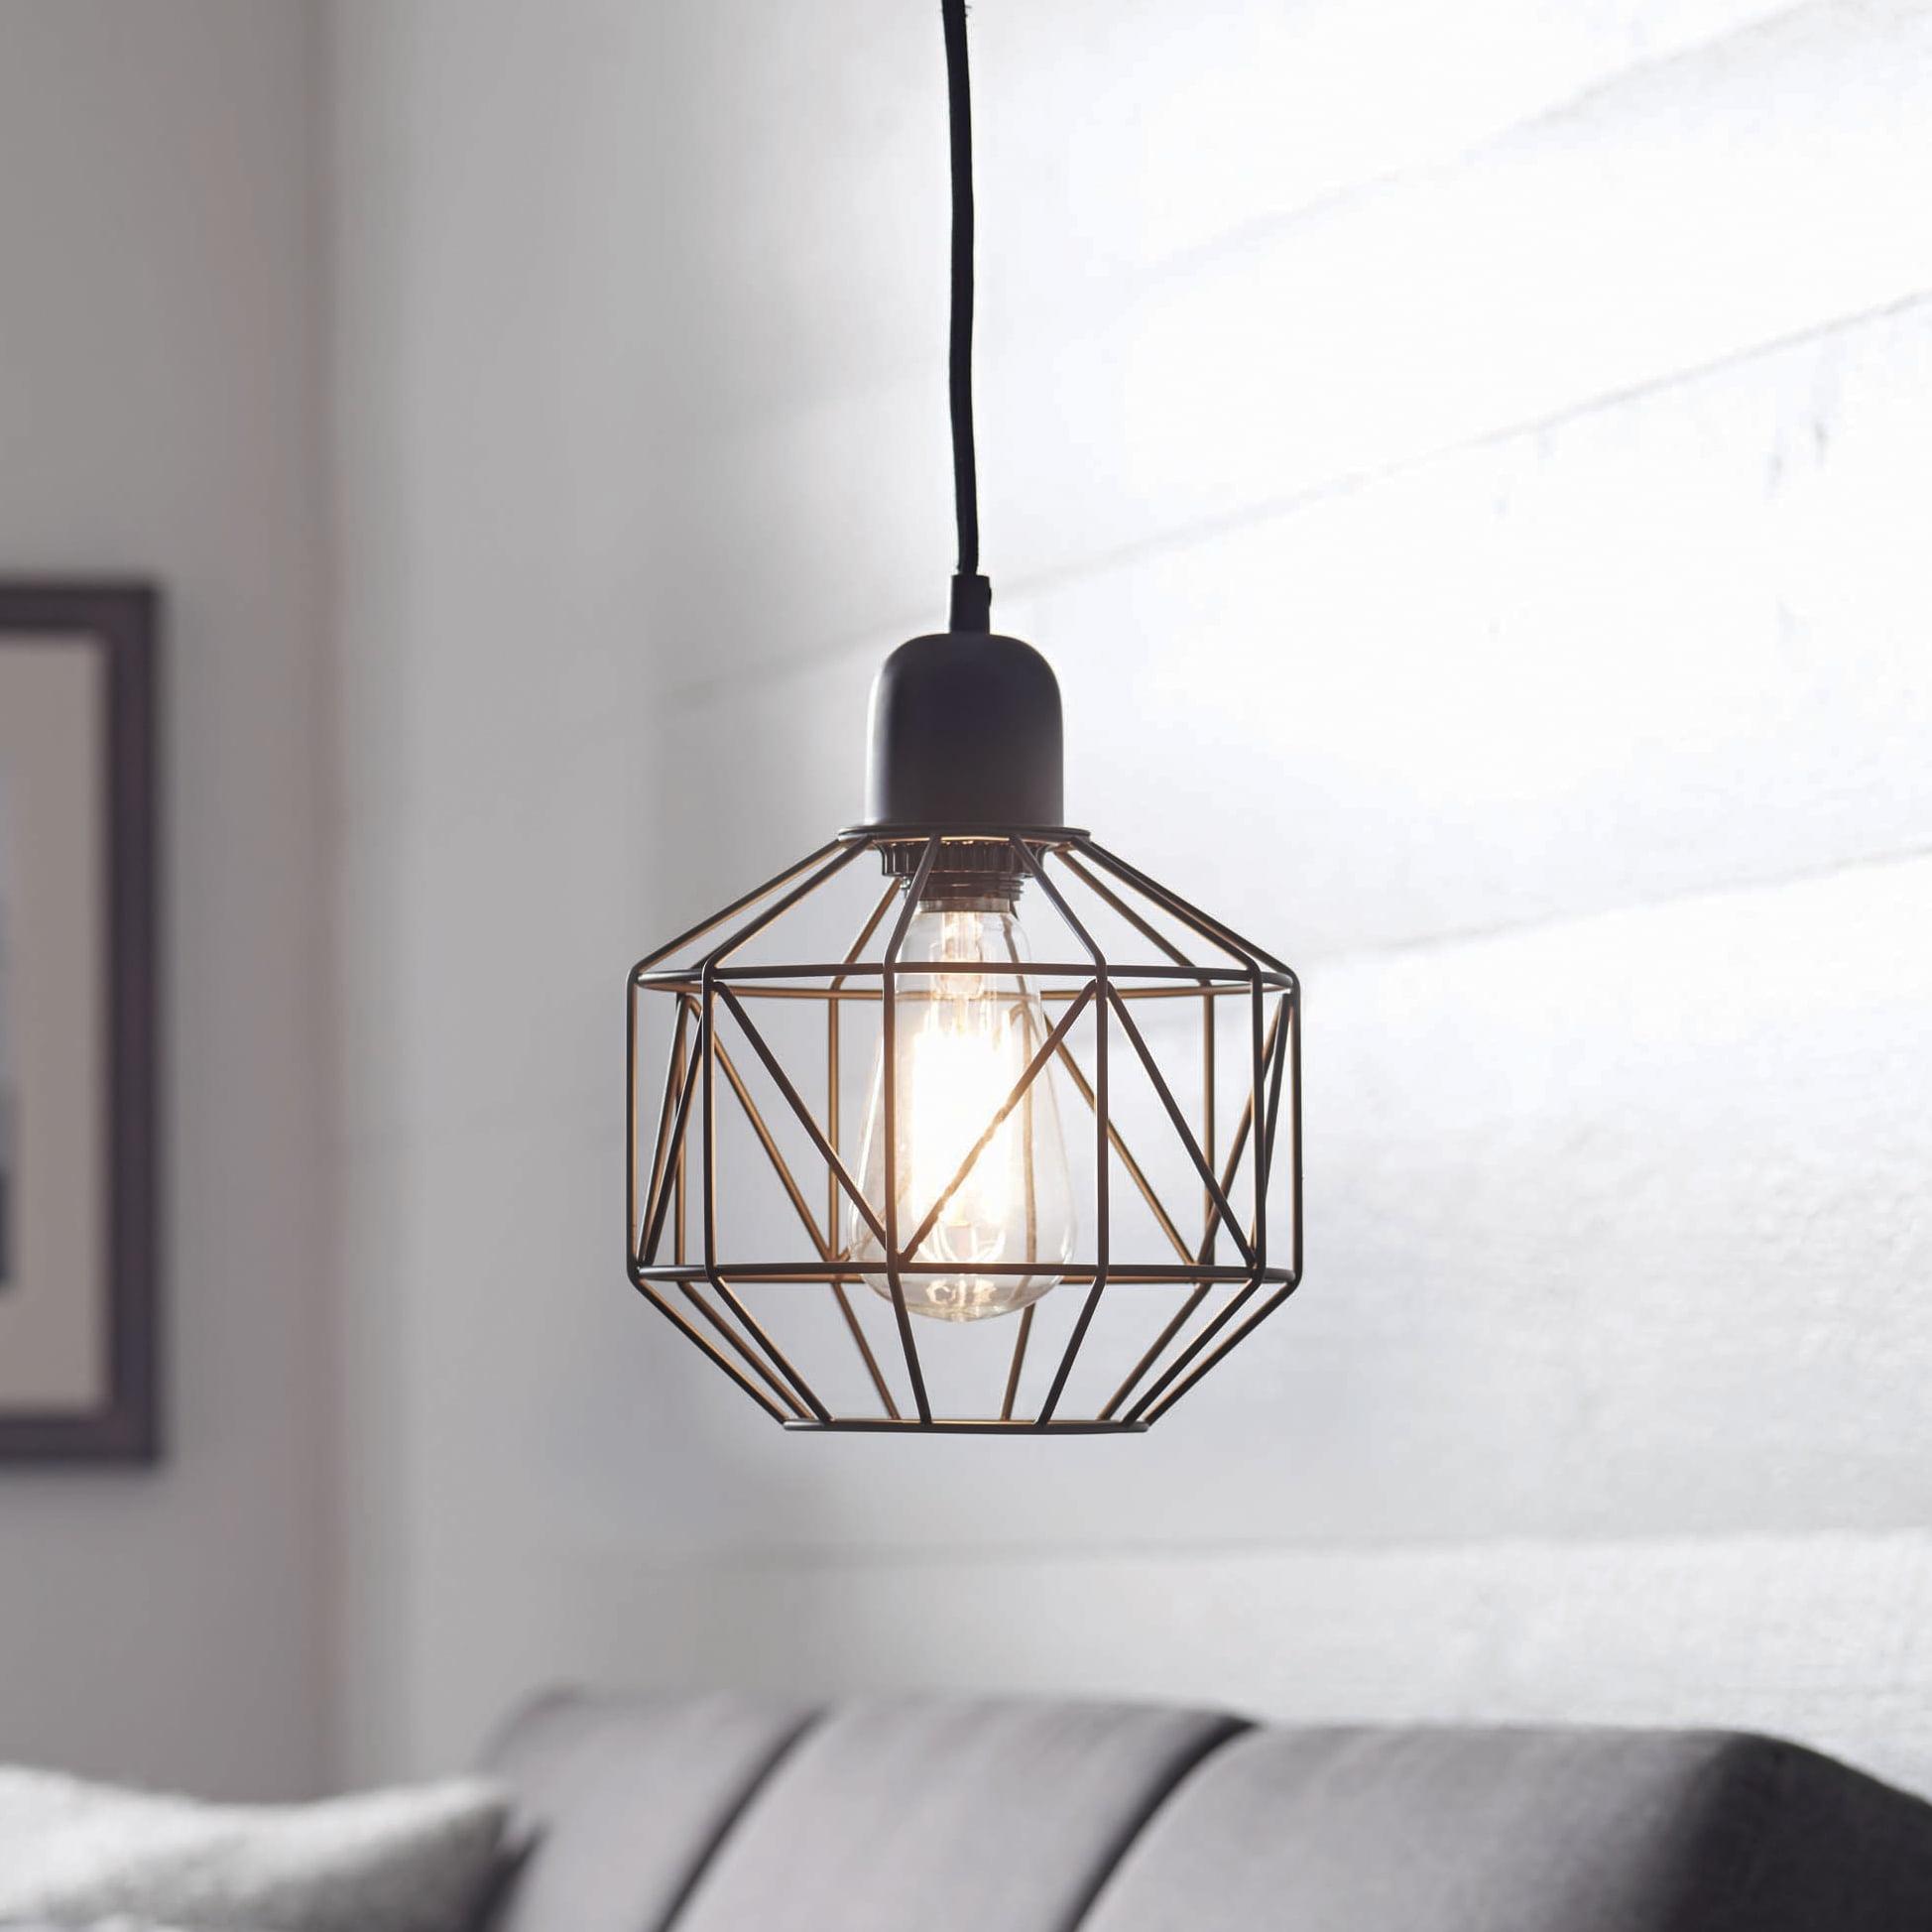 Better Homes & Gardens 8-Light Bronze Metal Cage Swag Pendant Light -  Walmart.com